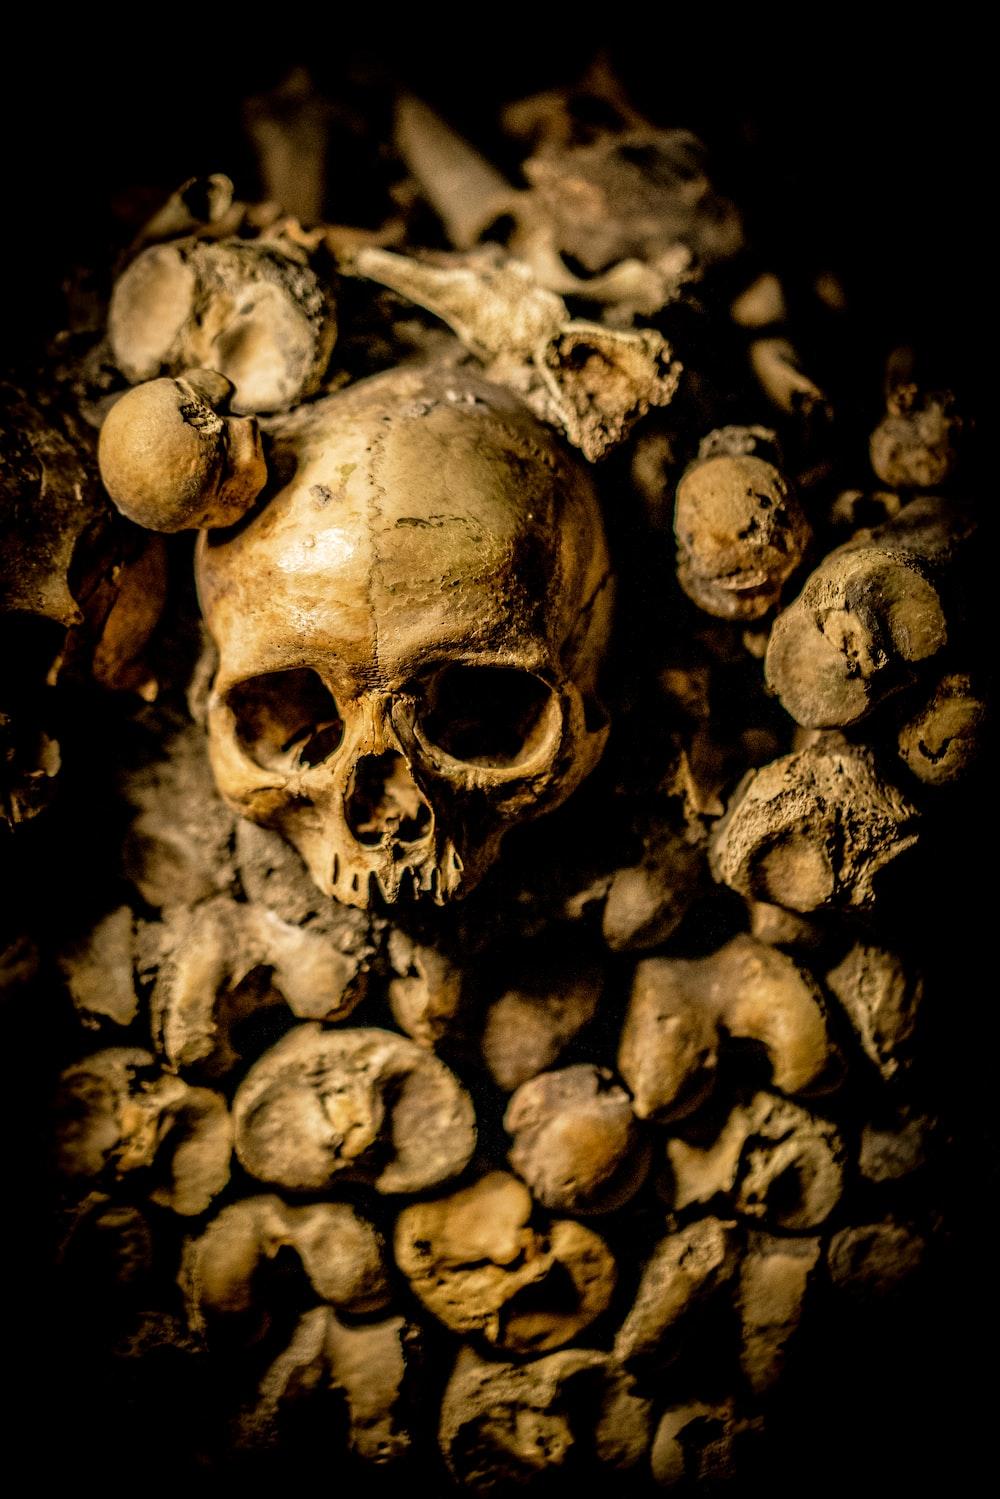 closeup photo of skull